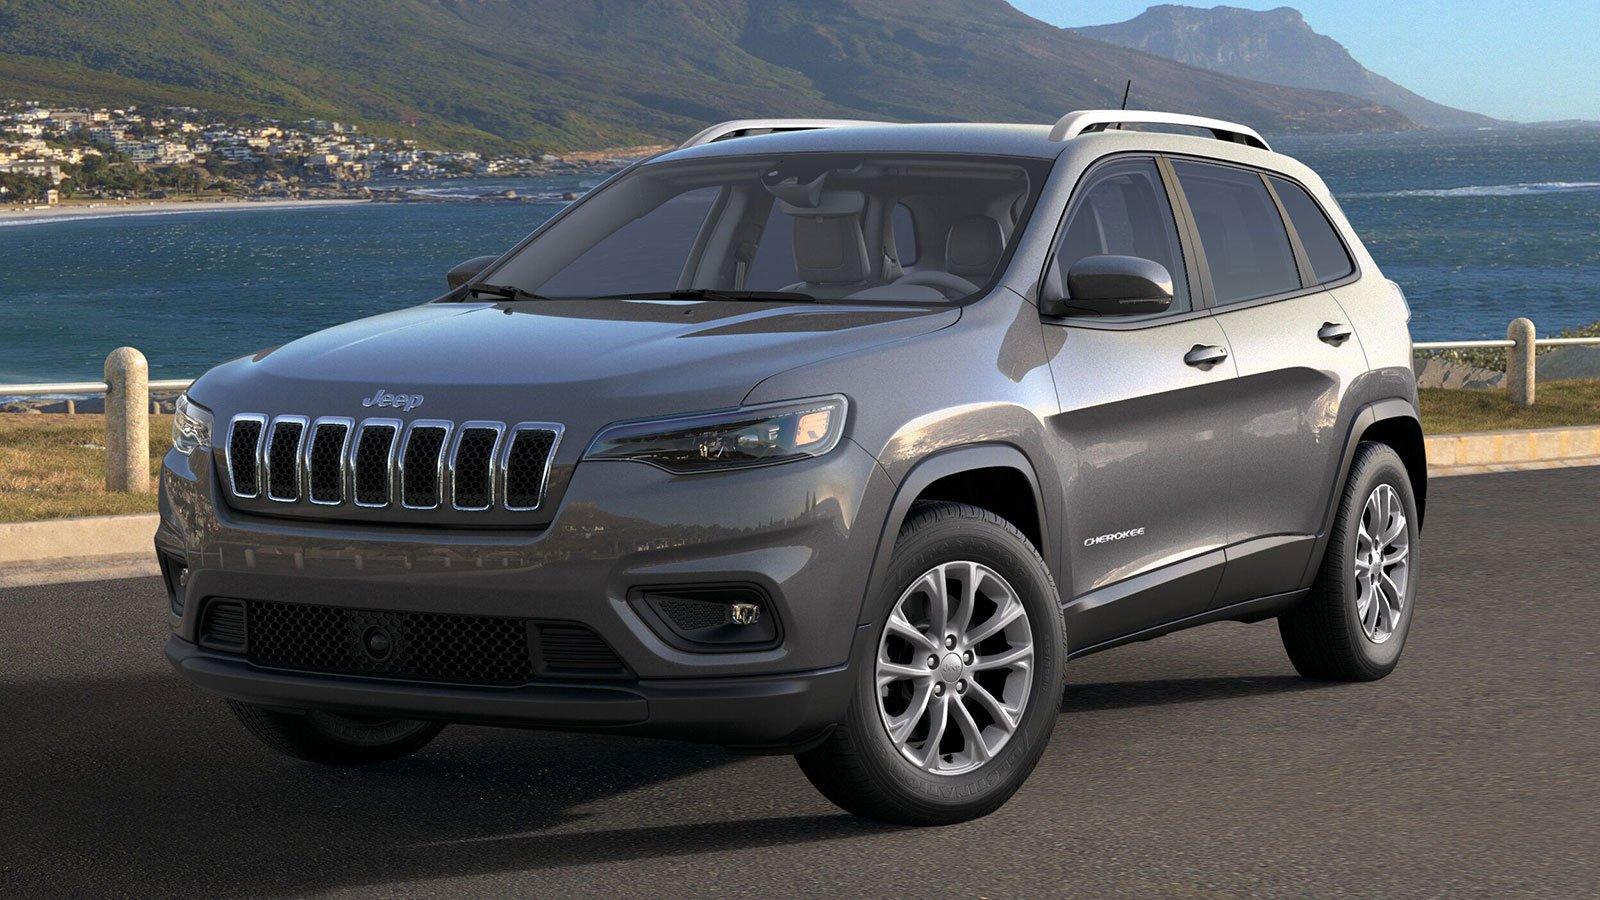 Jeep Cherokee Latitude LUX Adds Nappa Leather